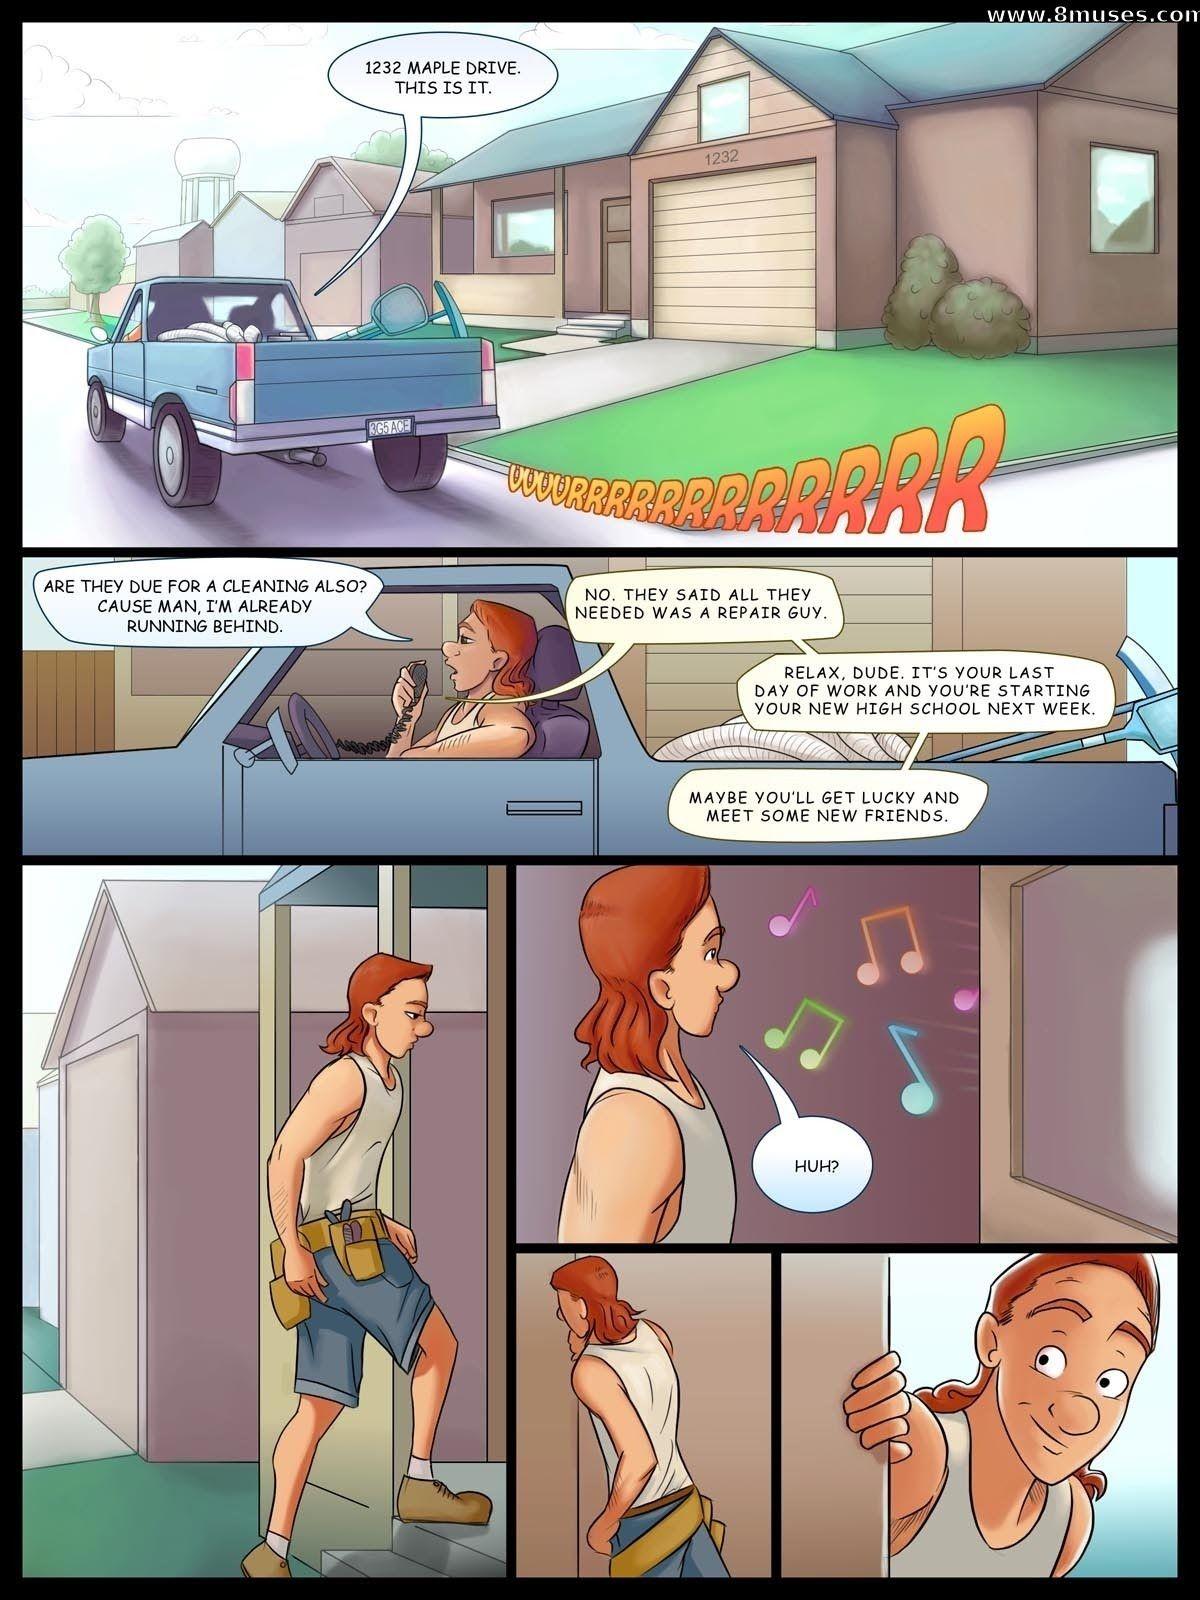 Jab Comics Smile Images